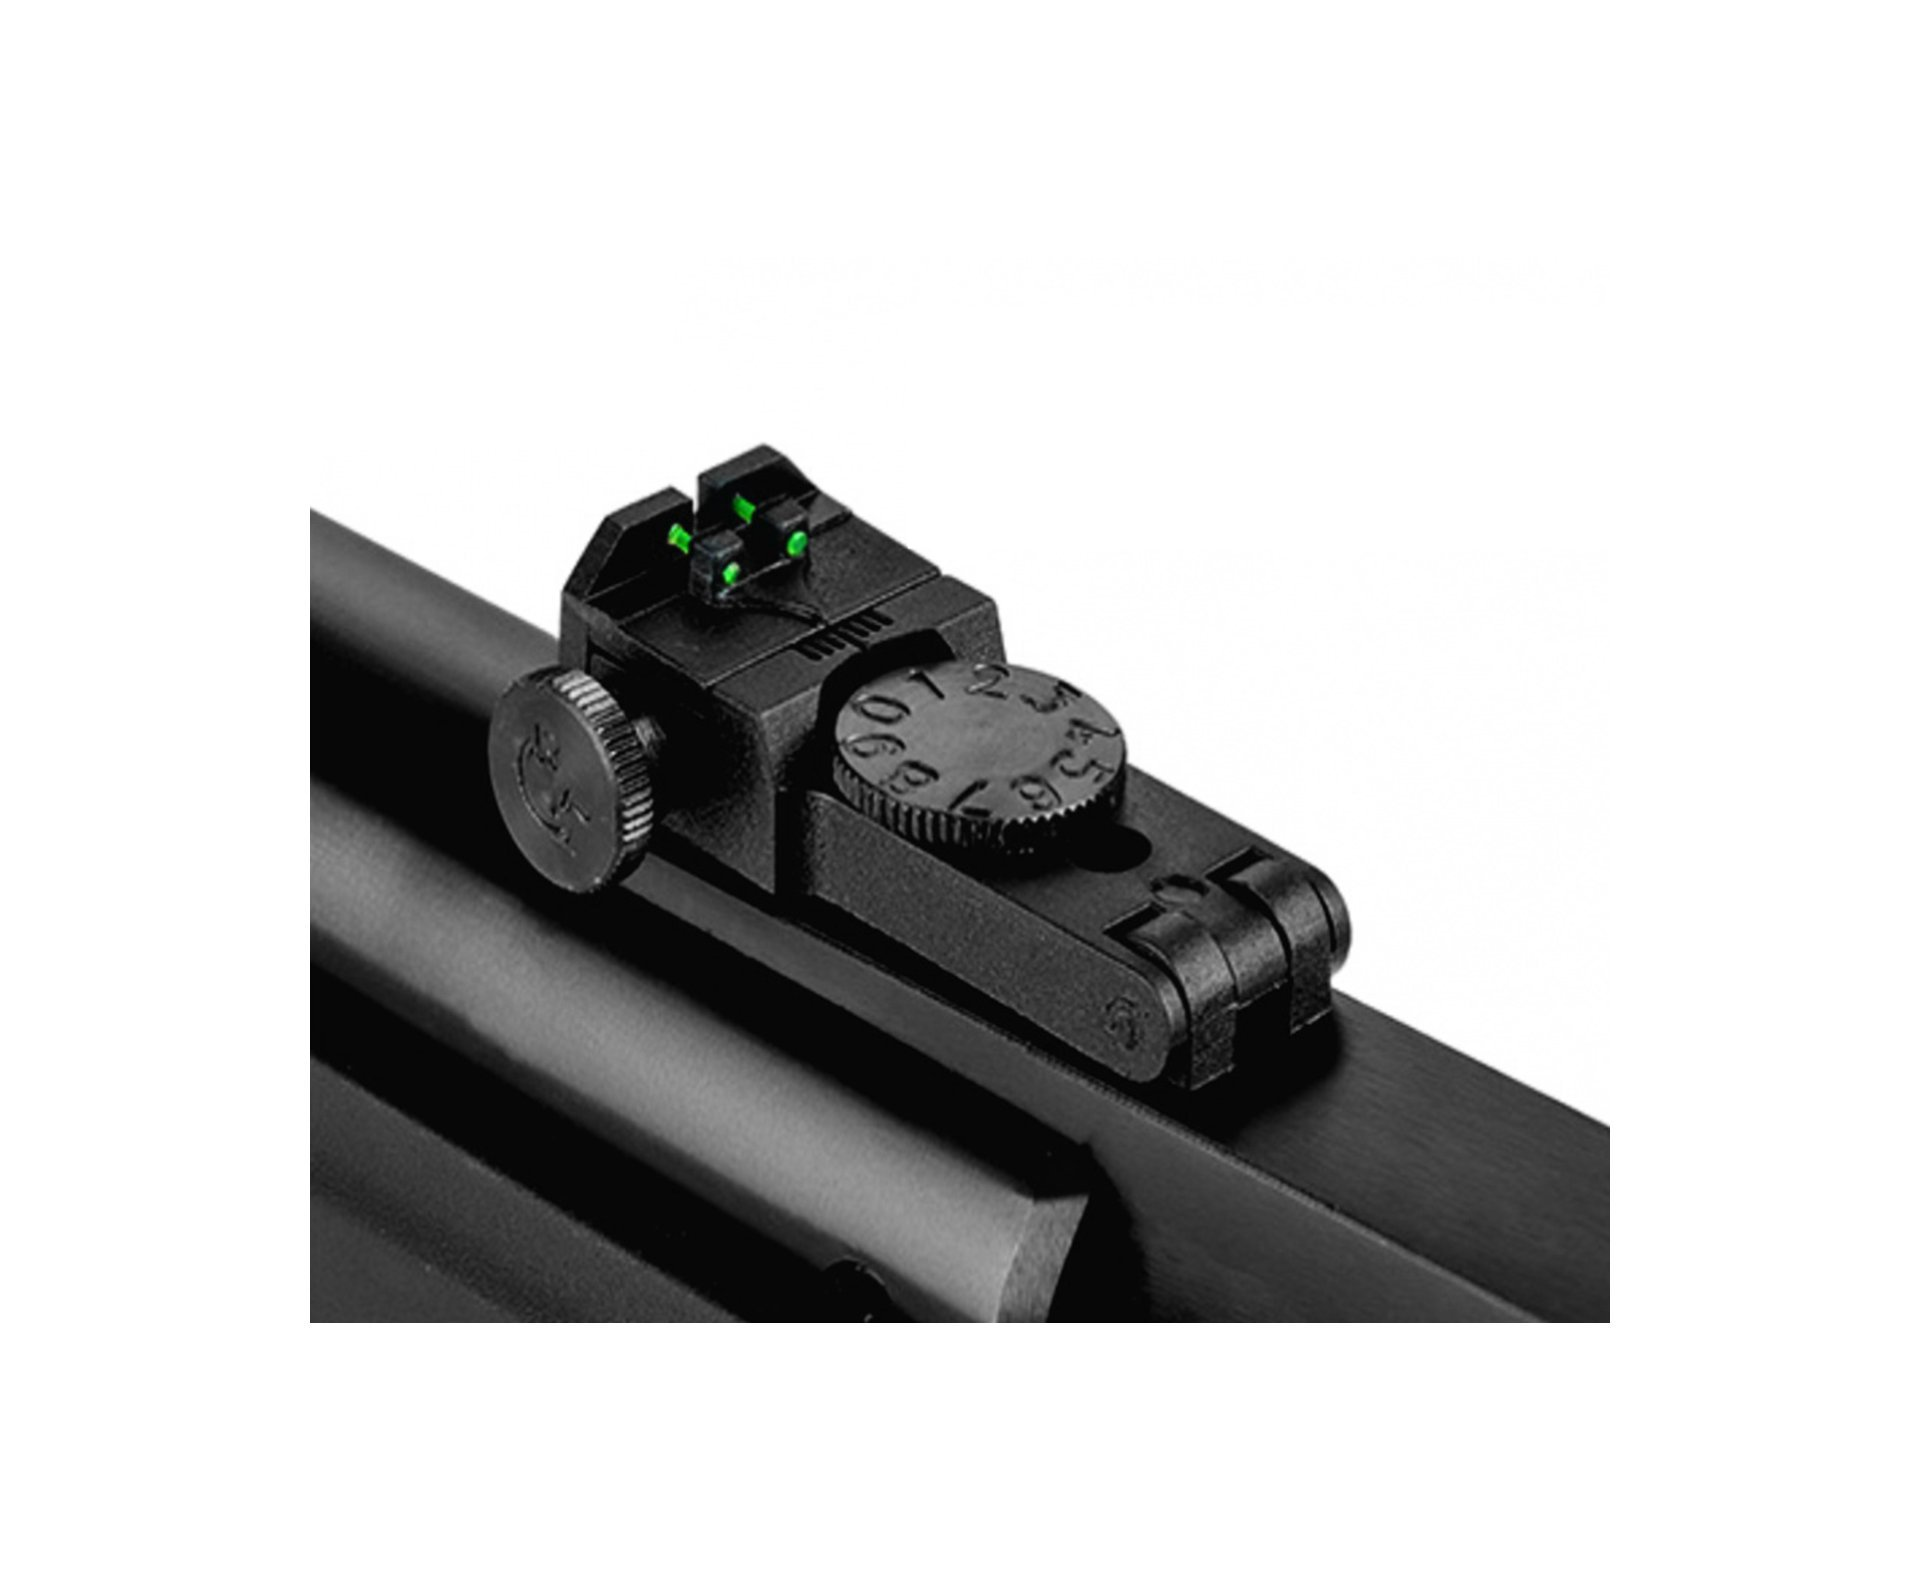 Carabina De Pressão Hatsan Striker Edge - Cal 5,5 Mm - Rossi